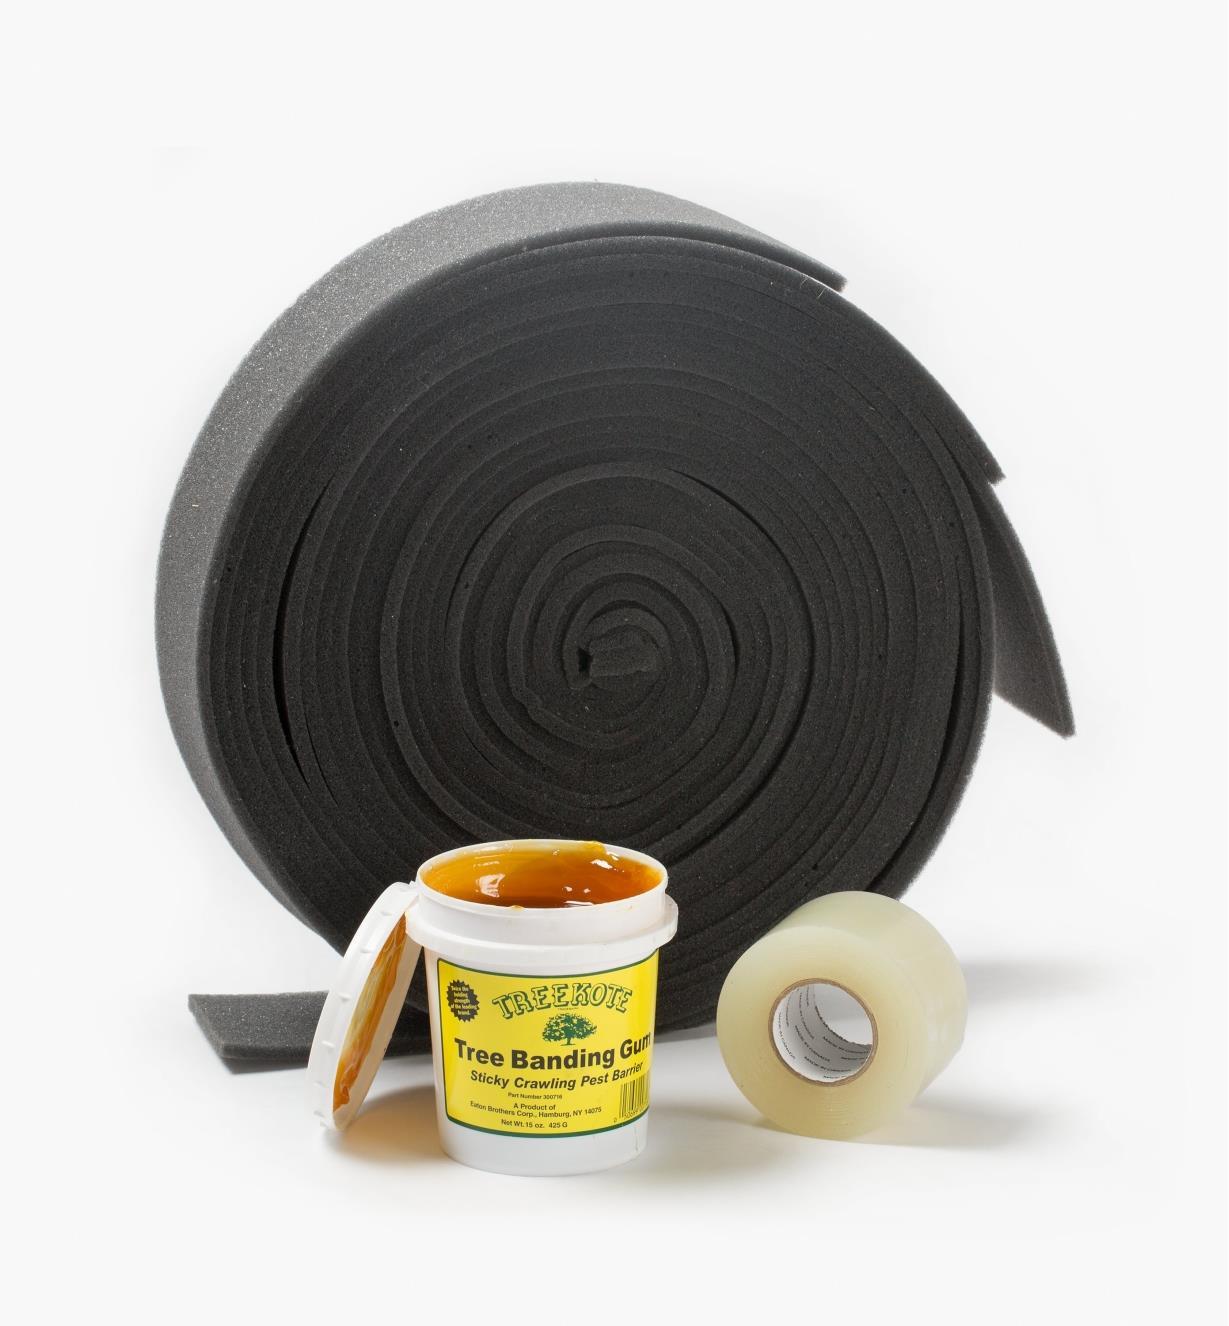 AA502 - Tree Banding Kit